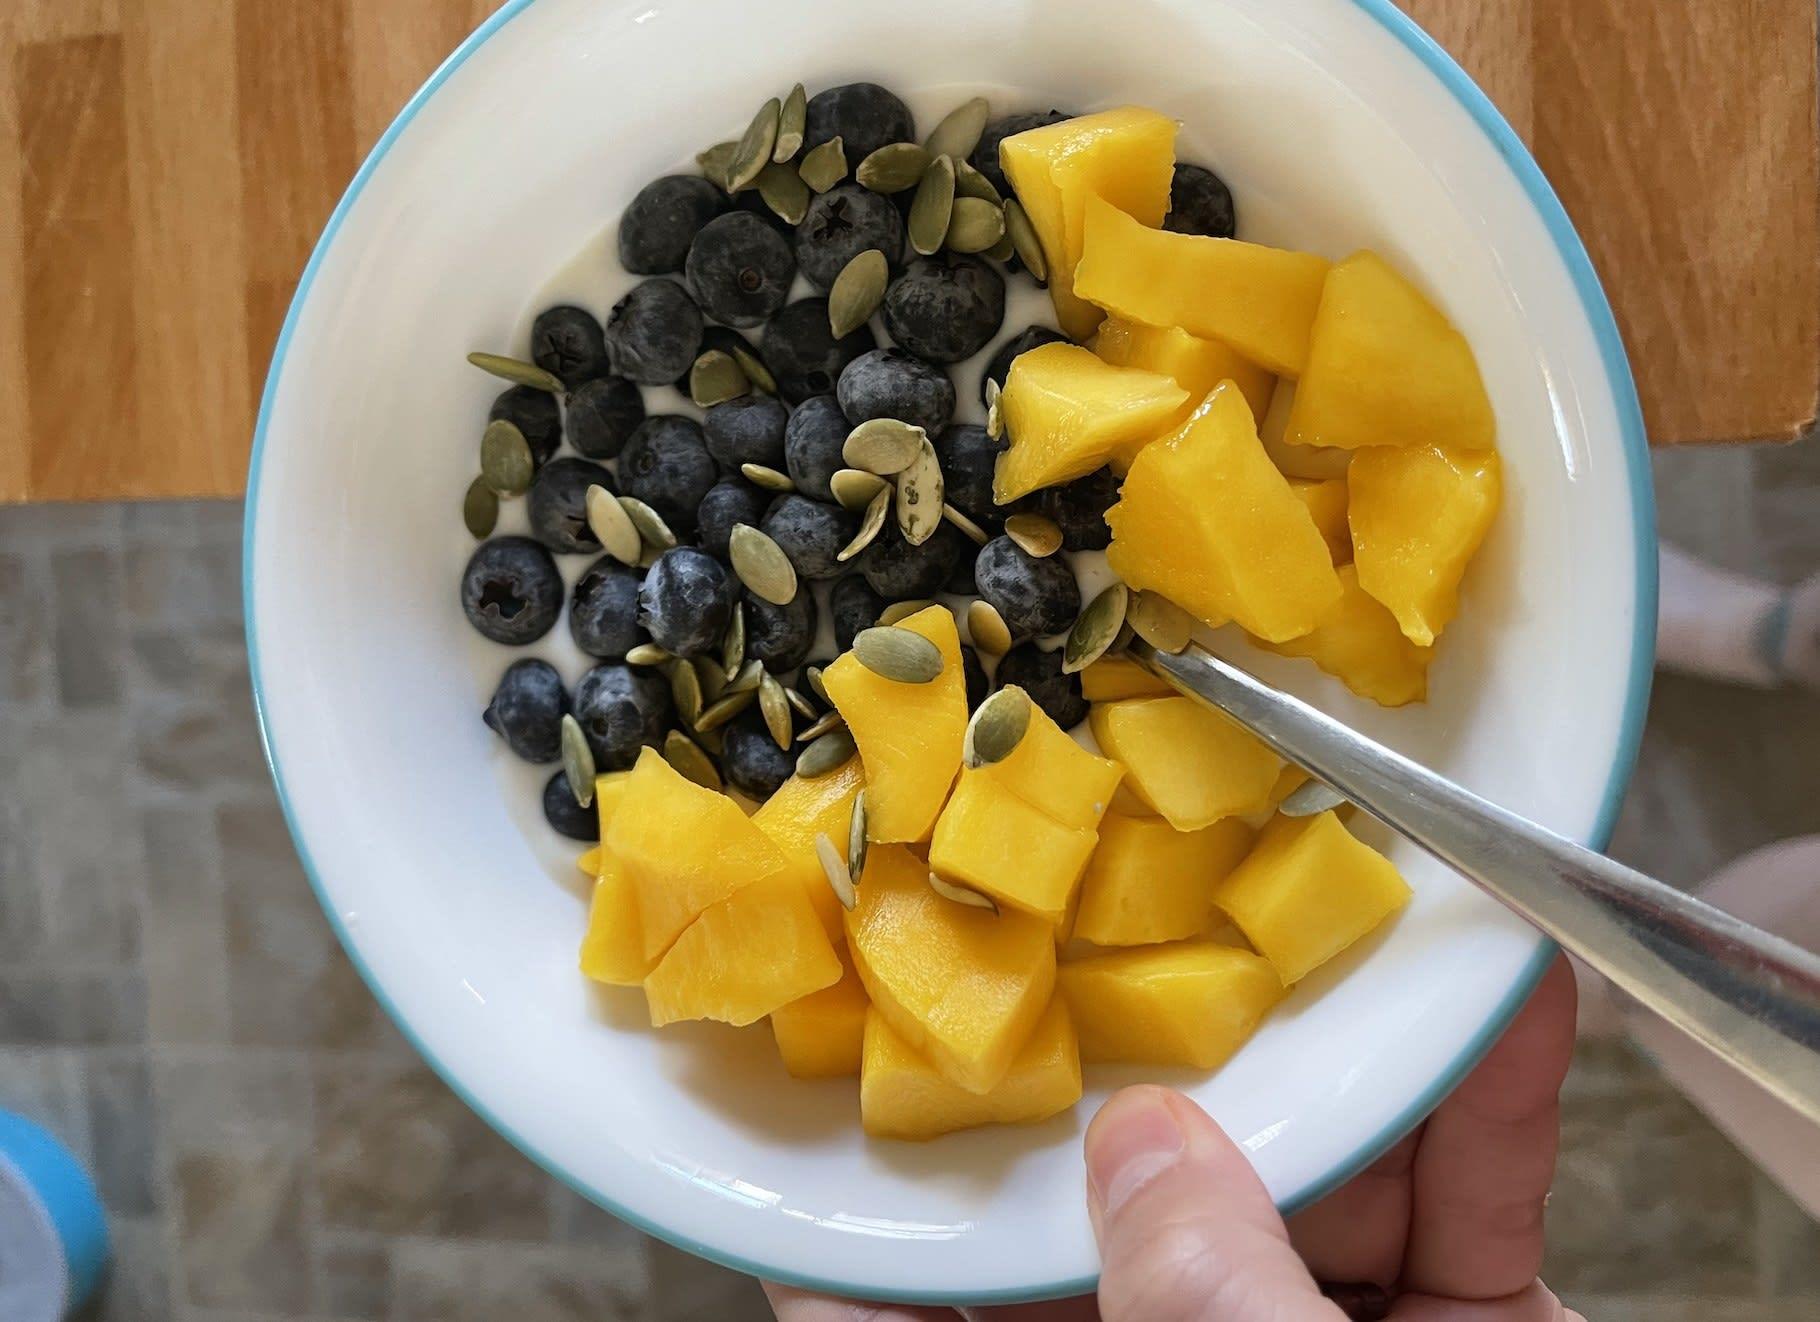 A bowl of fruit and yogurt